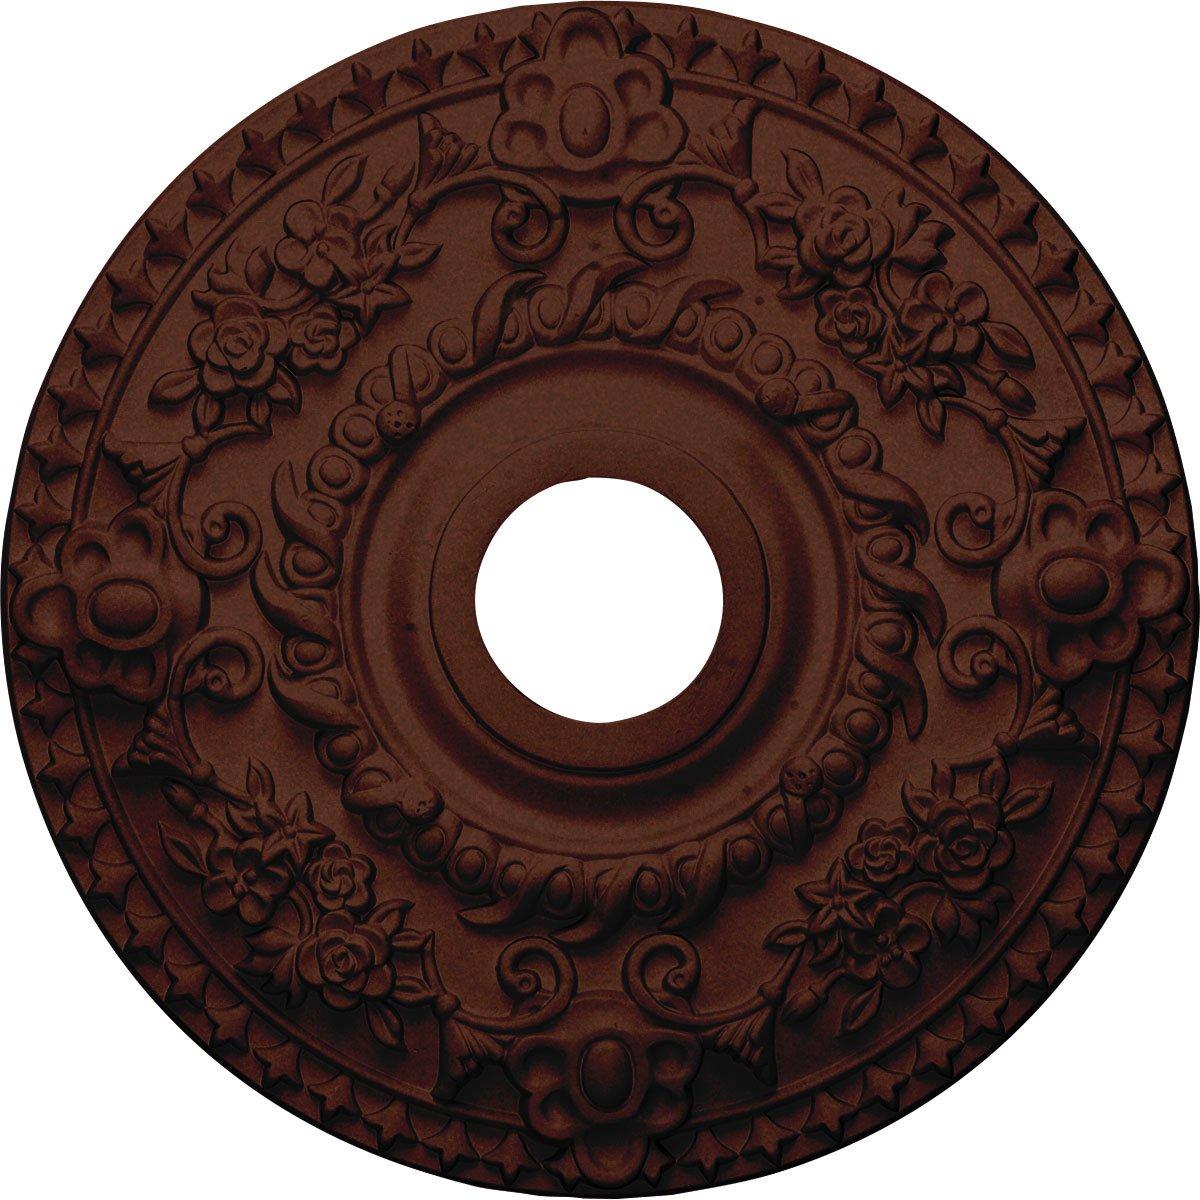 Ekena Millwork CM18ROACS Rose Ceiling Medallion, 18'' OD x 3 1/2'' ID x 1 1/2'' P, Antique Copper